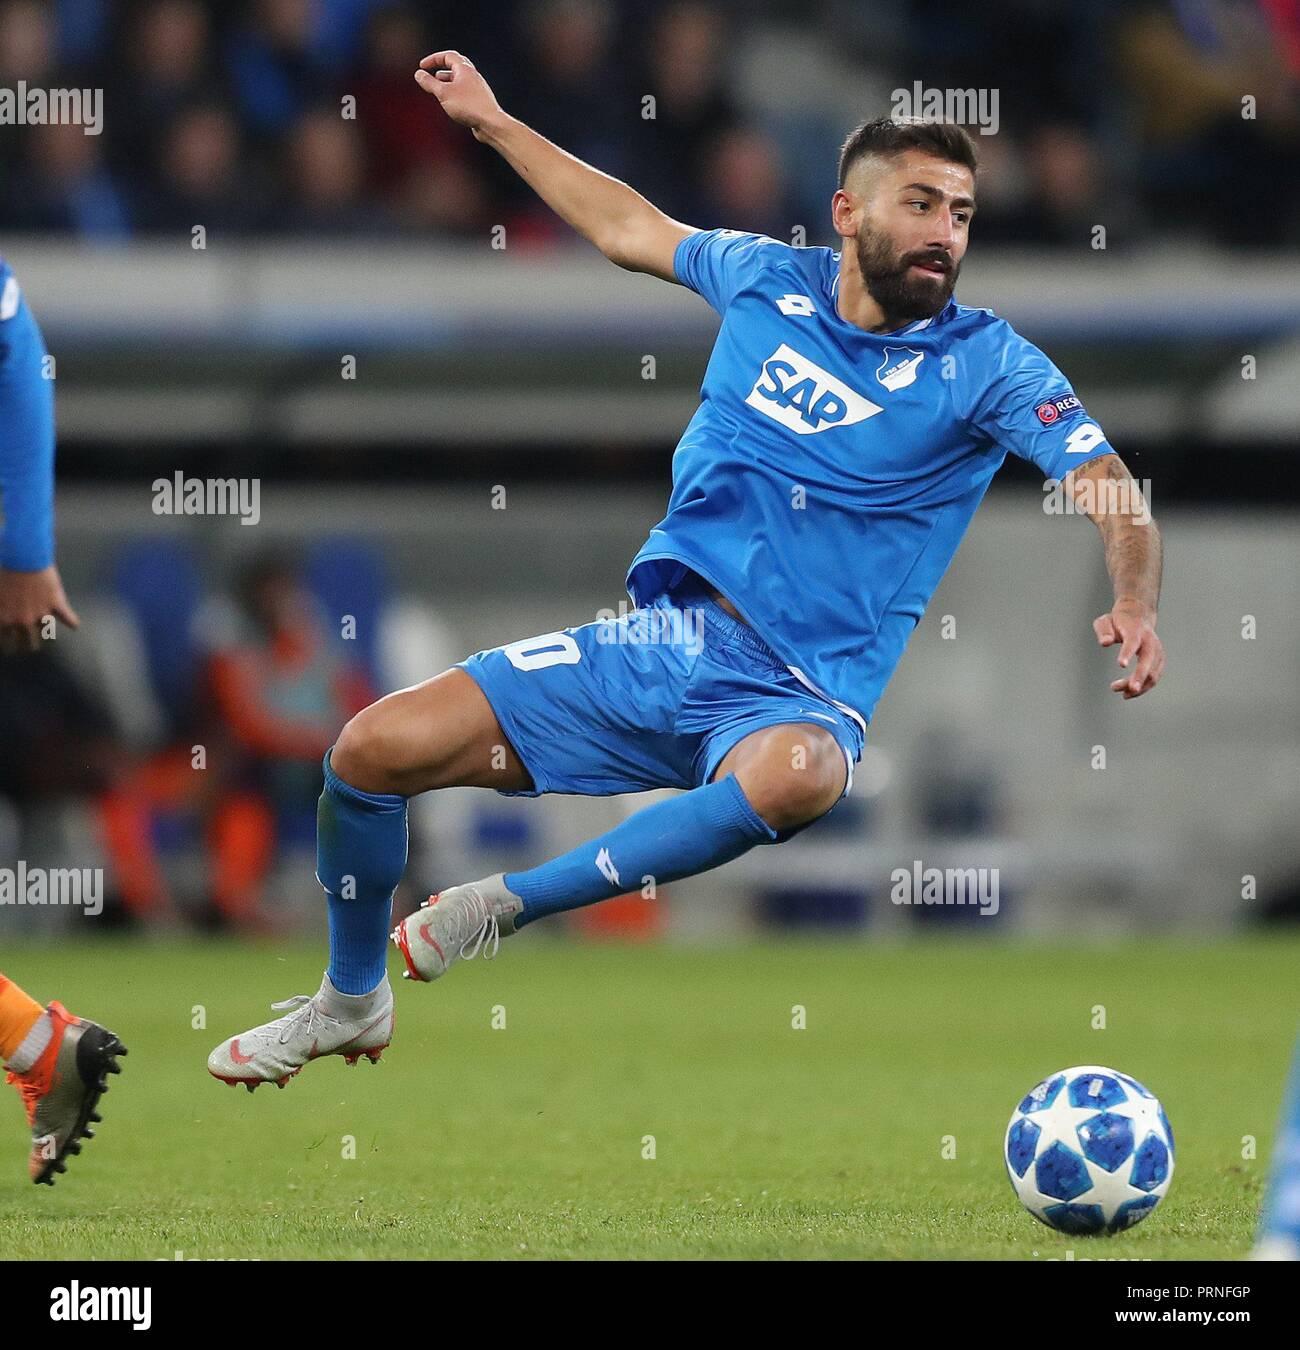 firo: 02.10.2018 Football, Football, Champions League: TSG Hoffenheim - Manchester City 1: 2 single action, Kerem Demirbay   usage worldwide - Stock Image